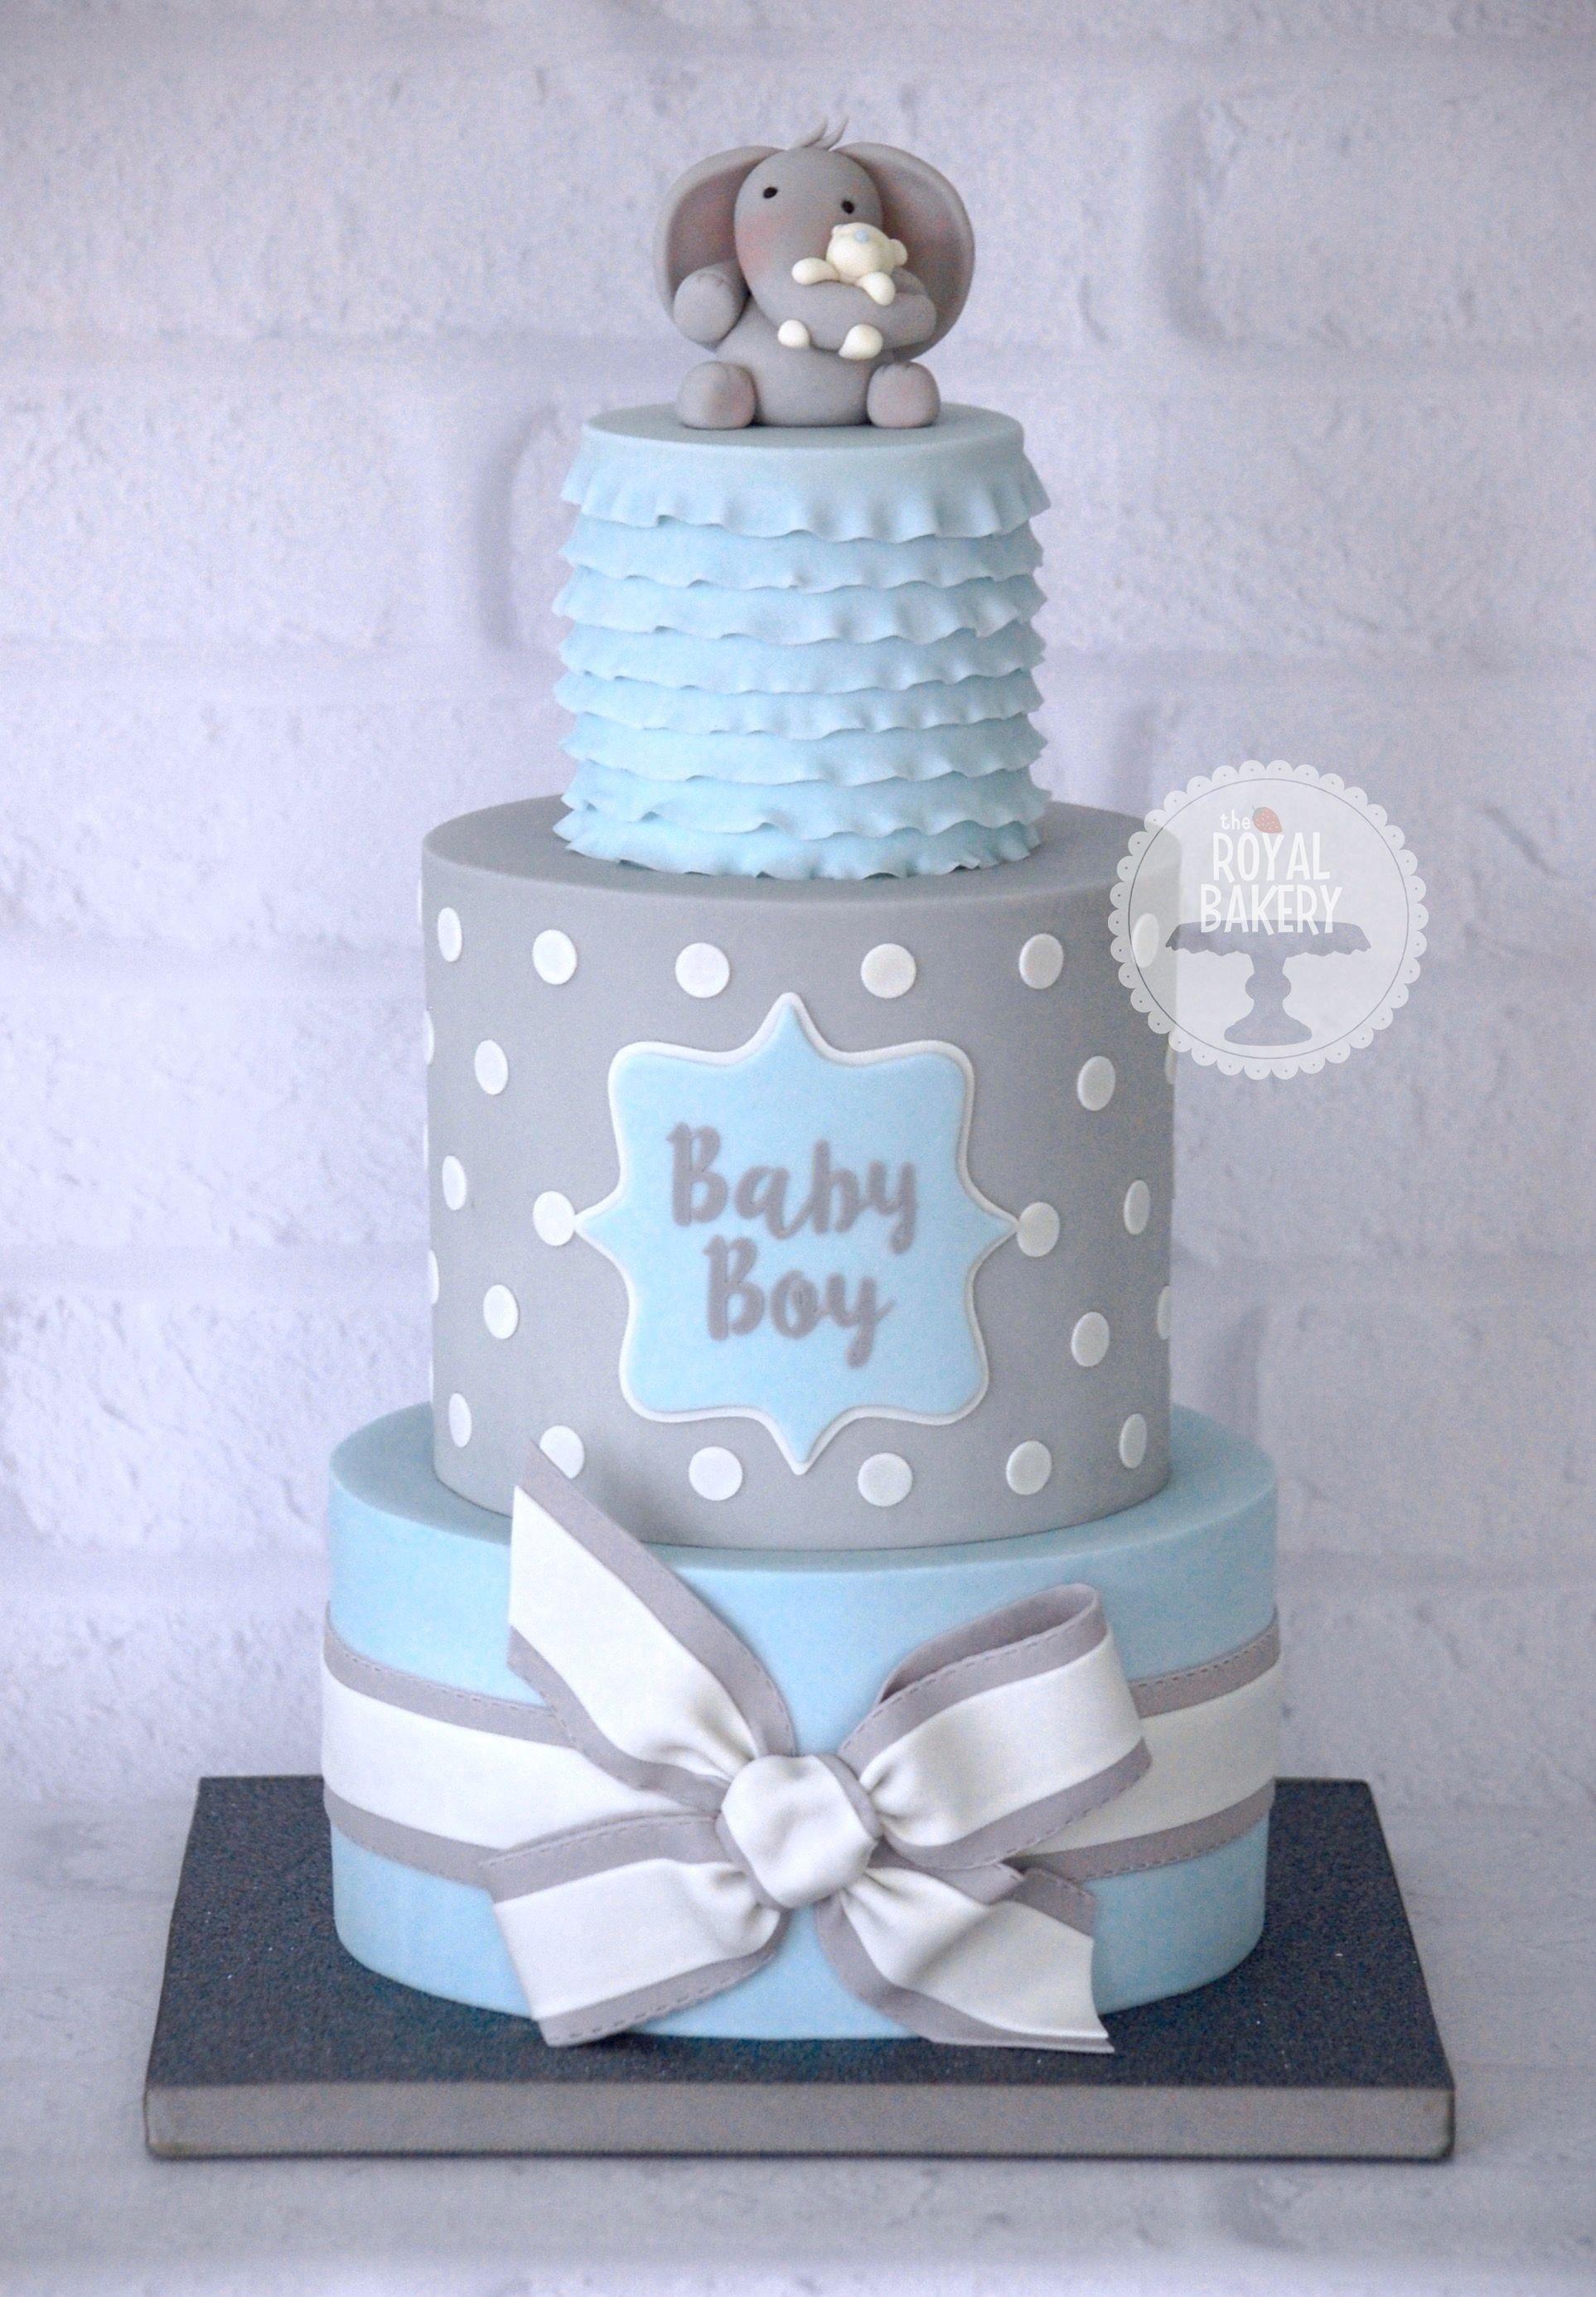 10 Pretty Boy Baby Shower Cake Ideas leachco snoogle total body pillow pregnancy pillow snoogle gray 2 2020